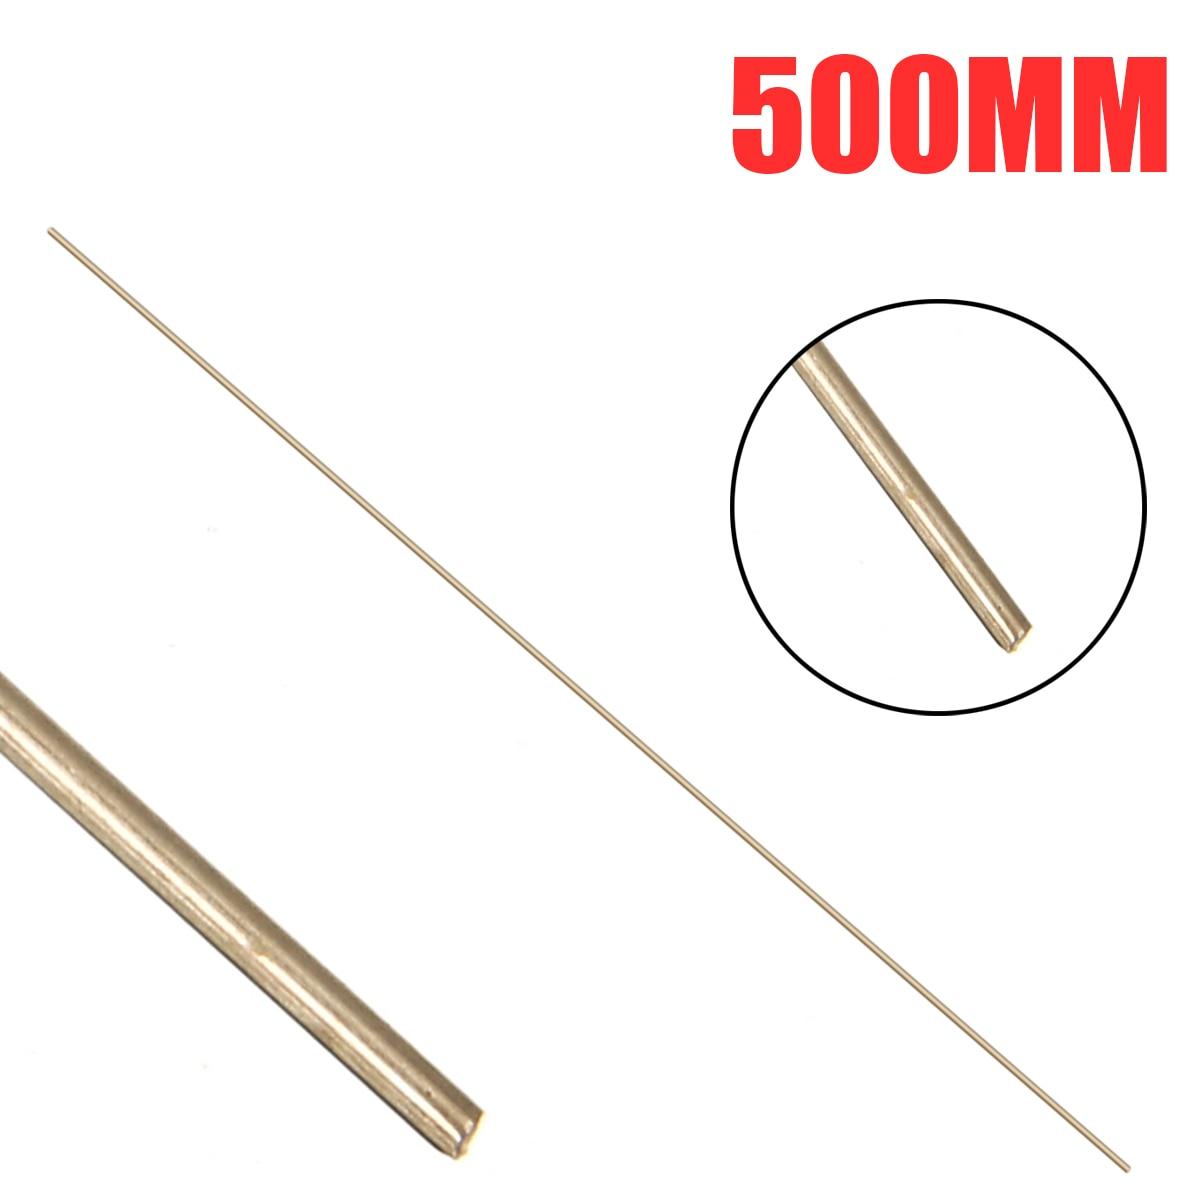 Silver Welding Rod 1.5mm Diameter Solder Rod Silver Solder Rod 56% Welding Rod Silver Based Solder Soldering Supplies